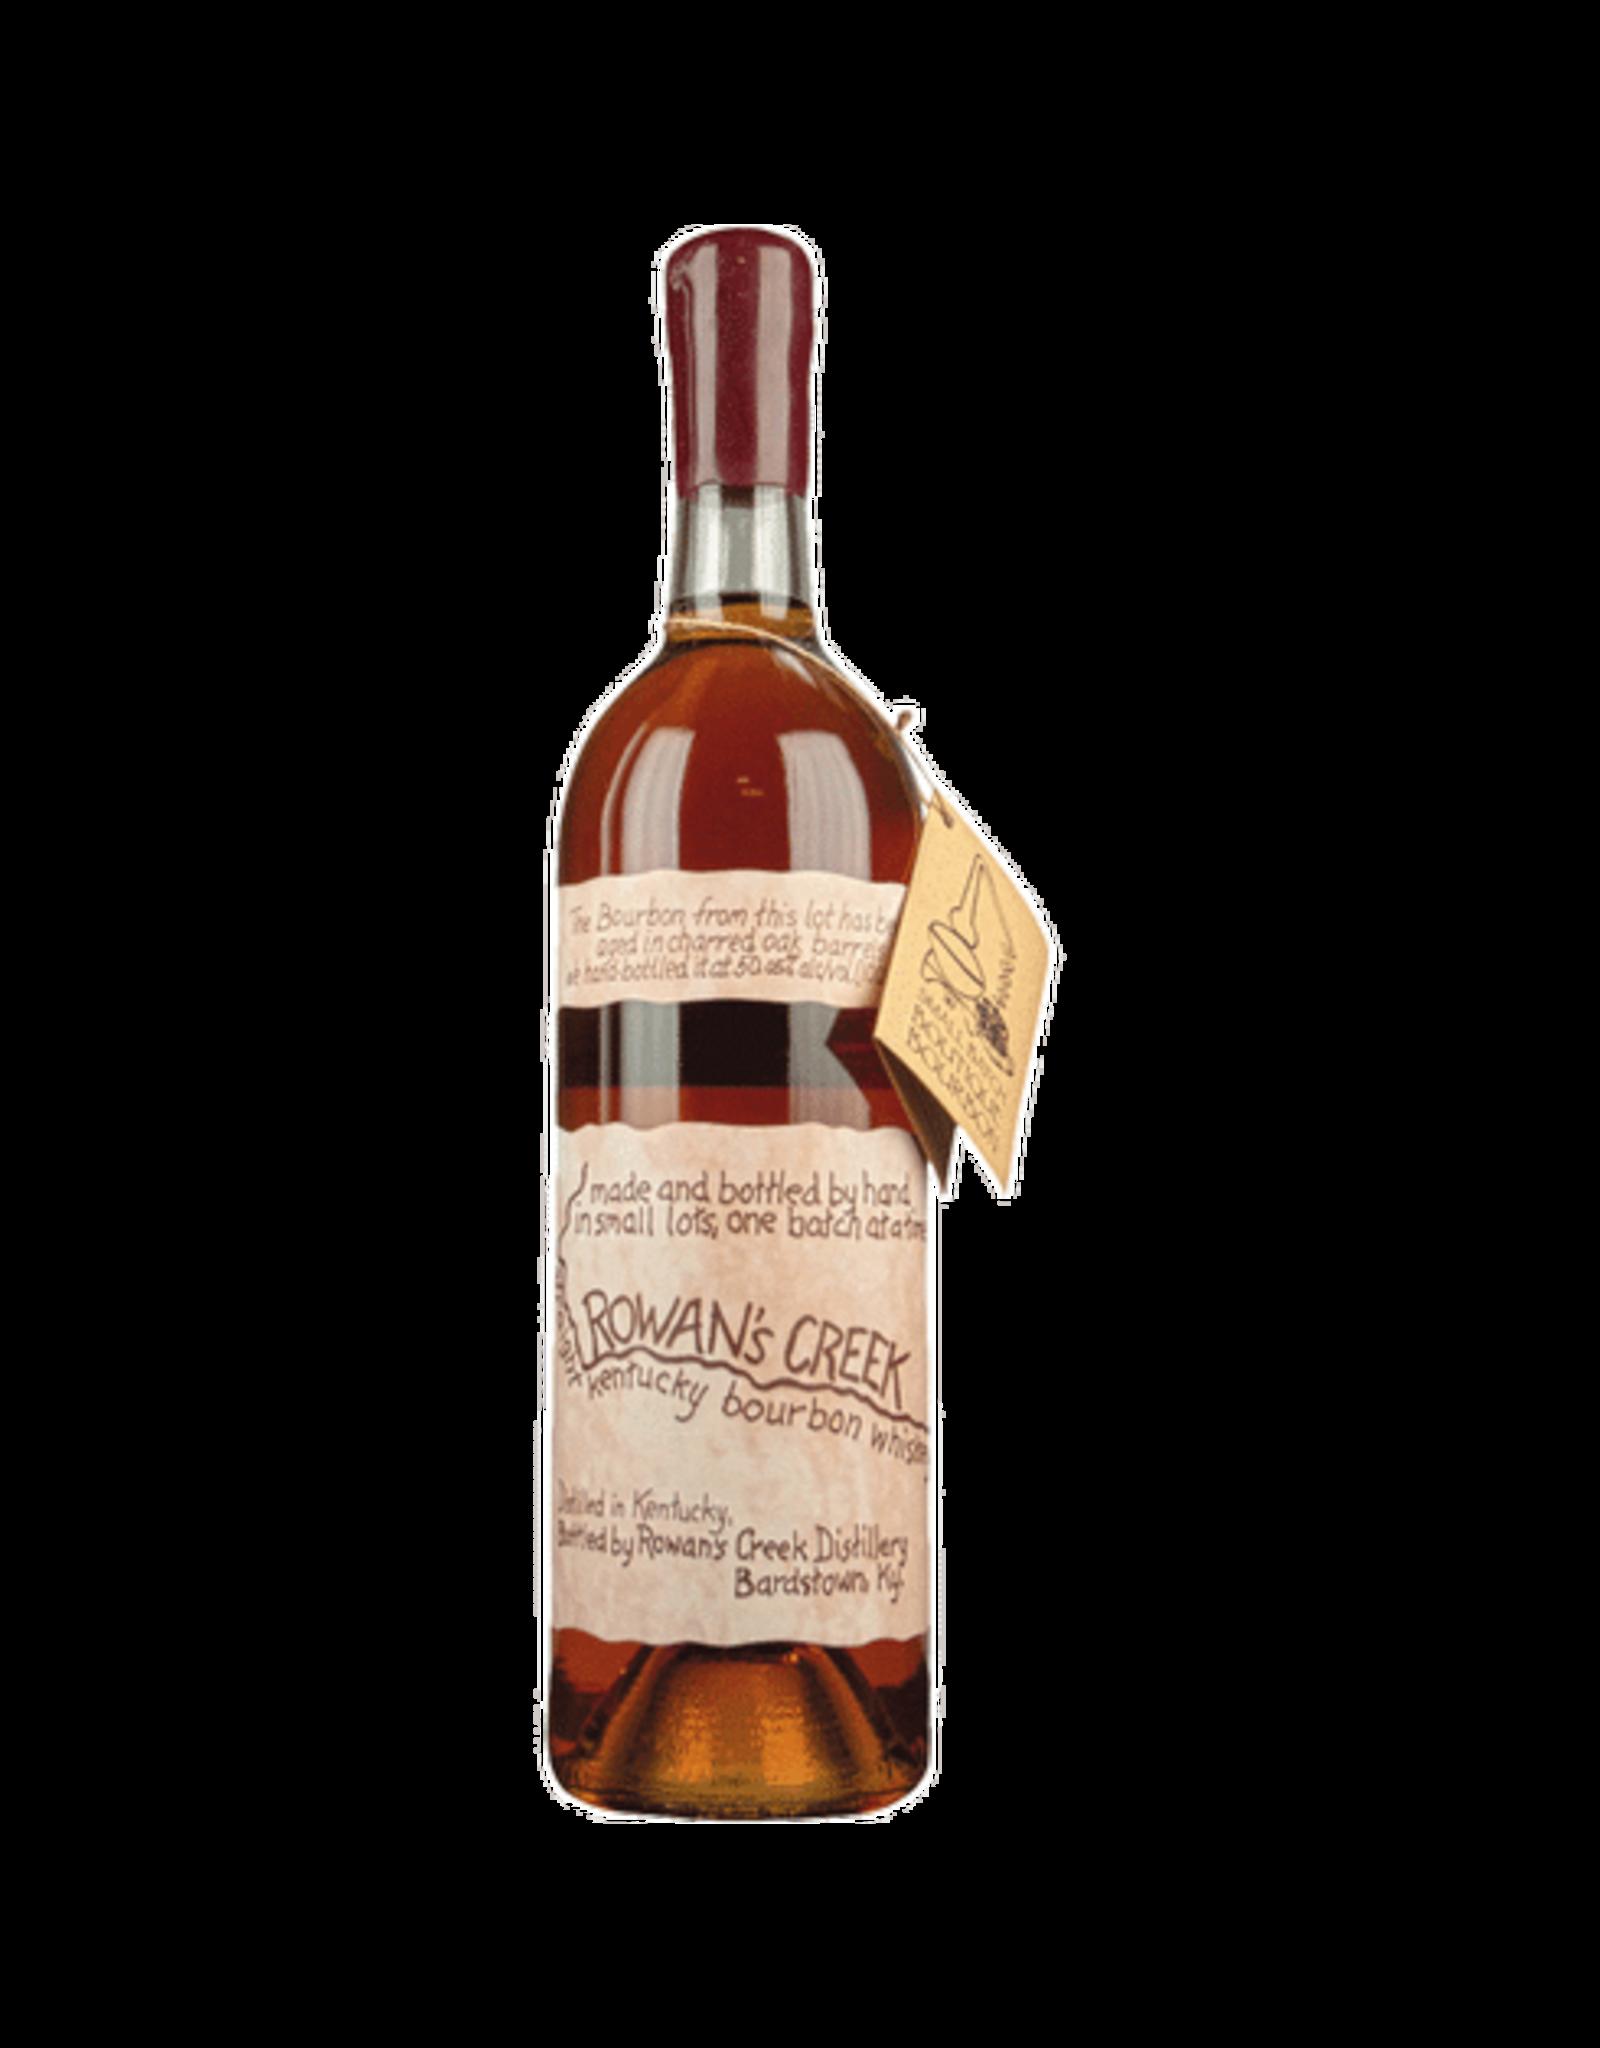 Rowan's Creek Small Batch Bourbon